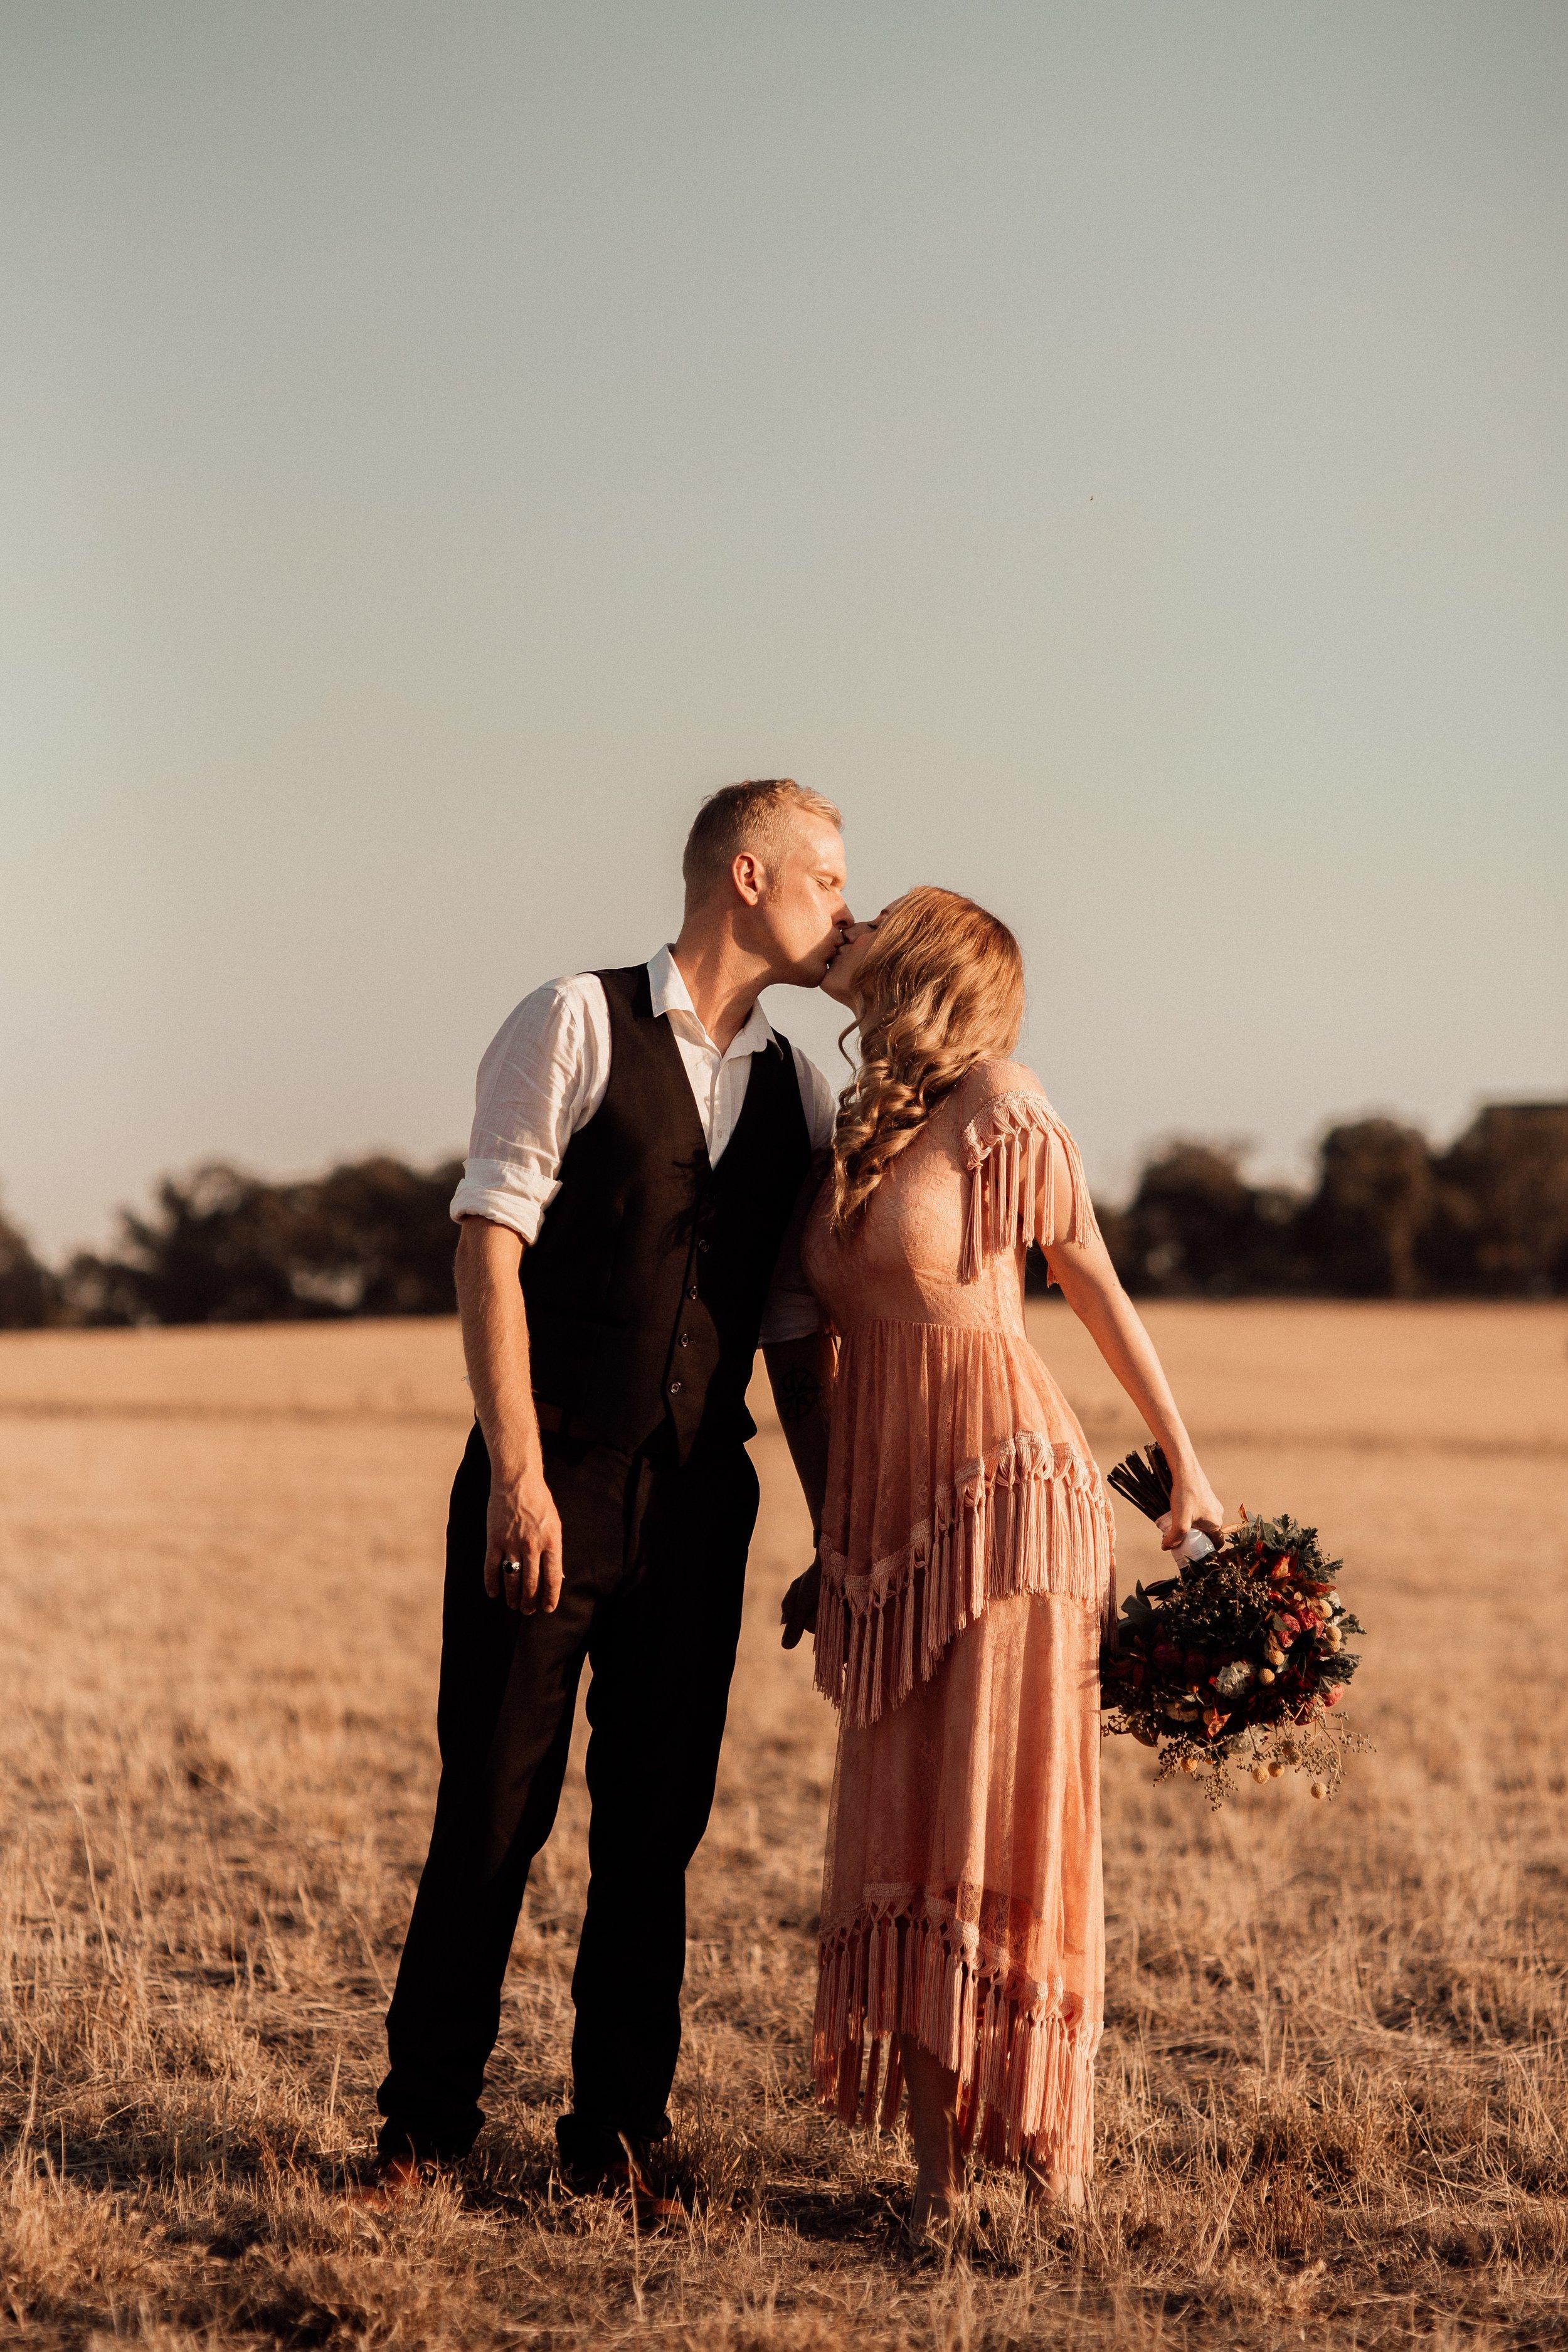 mickalathomas_puremacphotography_weddingphotographer_couplephotographer_Sheppartonphotographer_2074.jpg